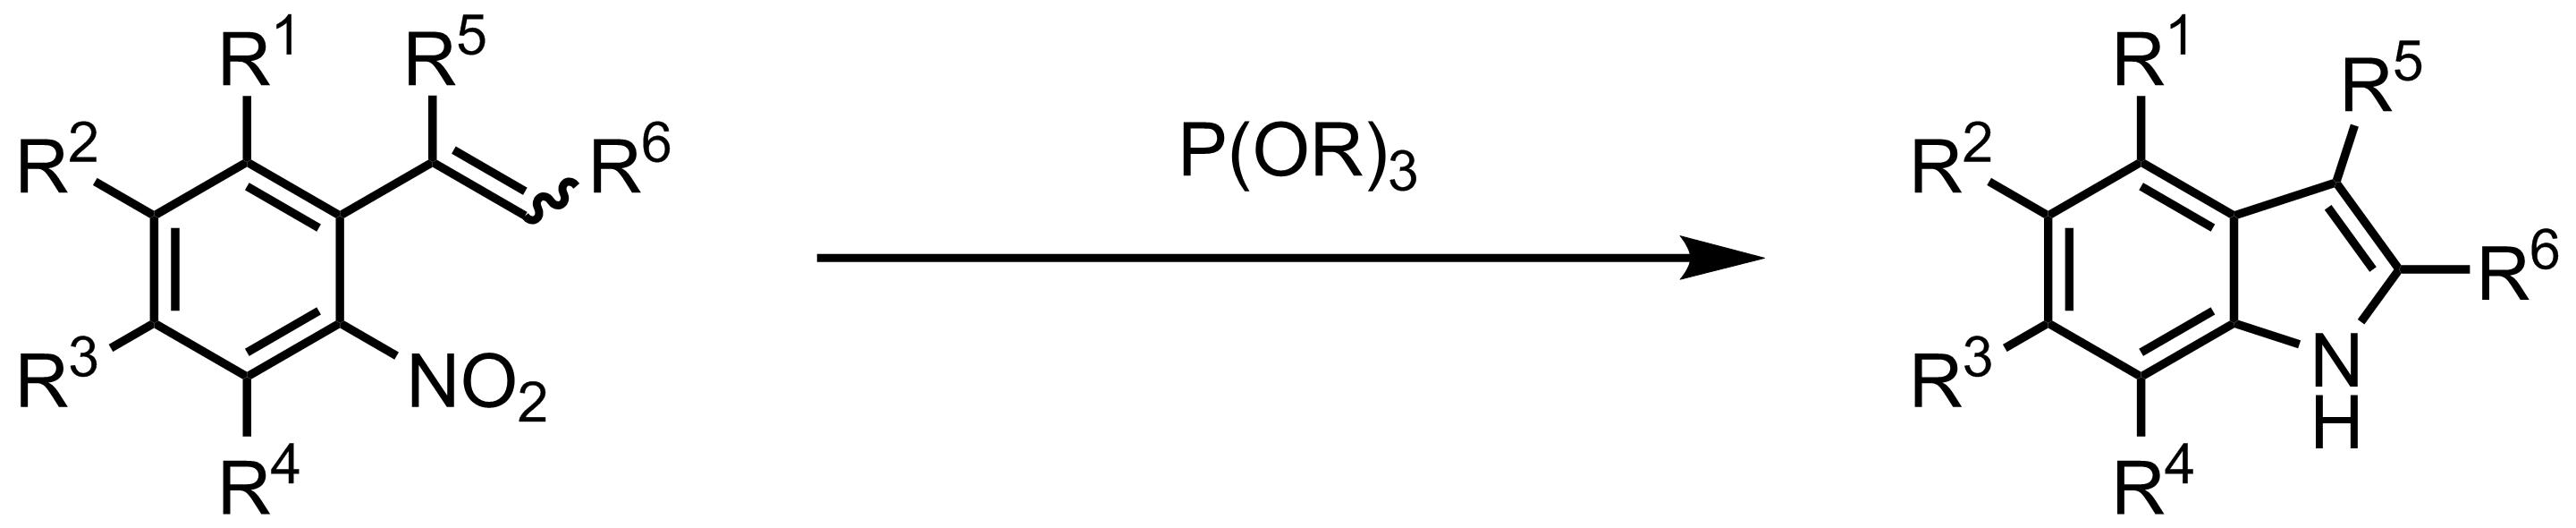 Schematic representation of the Cadogan-Sundberg Indole Synthesis.